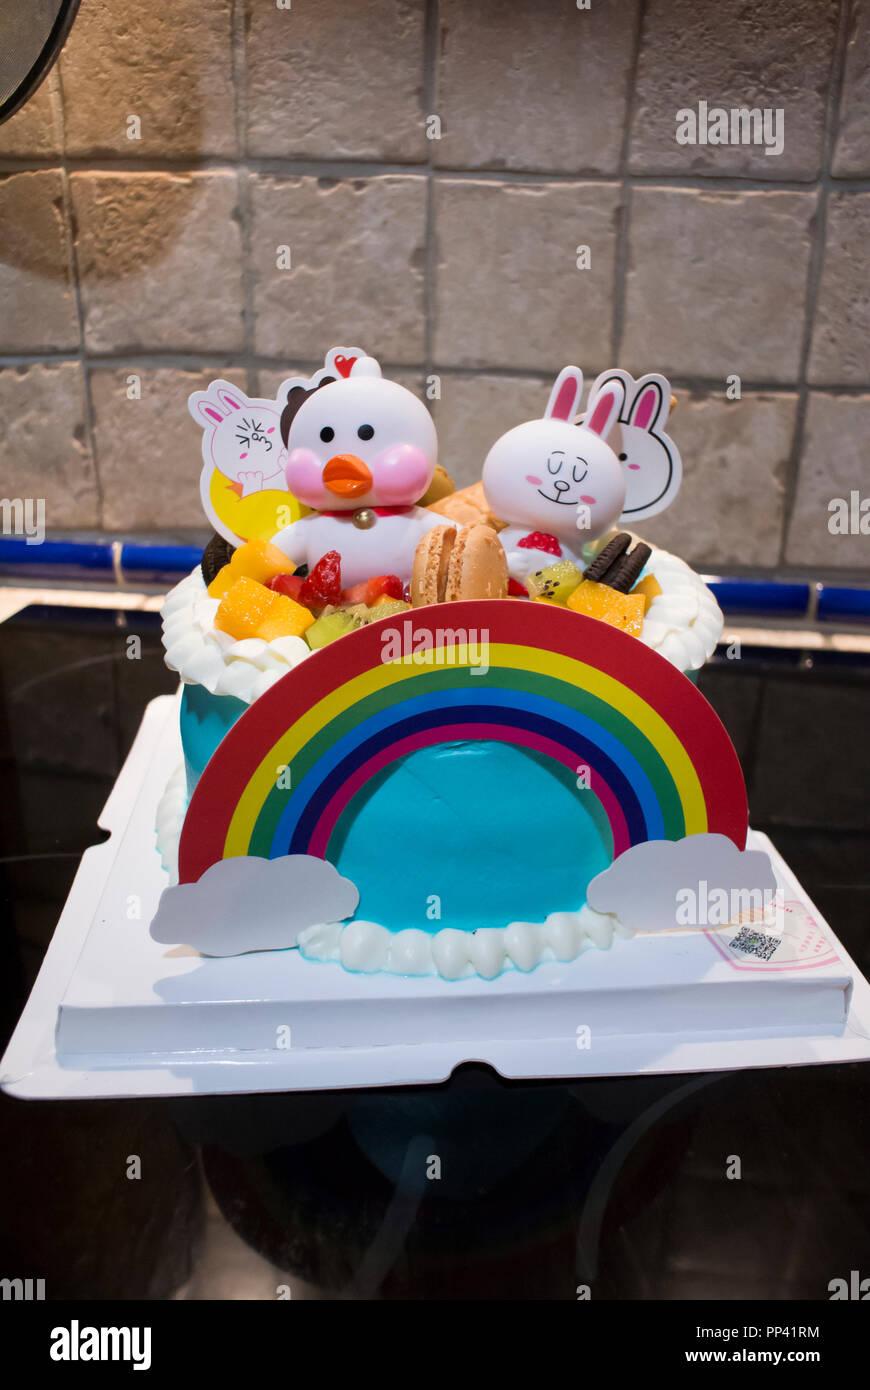 Admirable Gay Birthday Cake Stock Photo 220136104 Alamy Funny Birthday Cards Online Alyptdamsfinfo